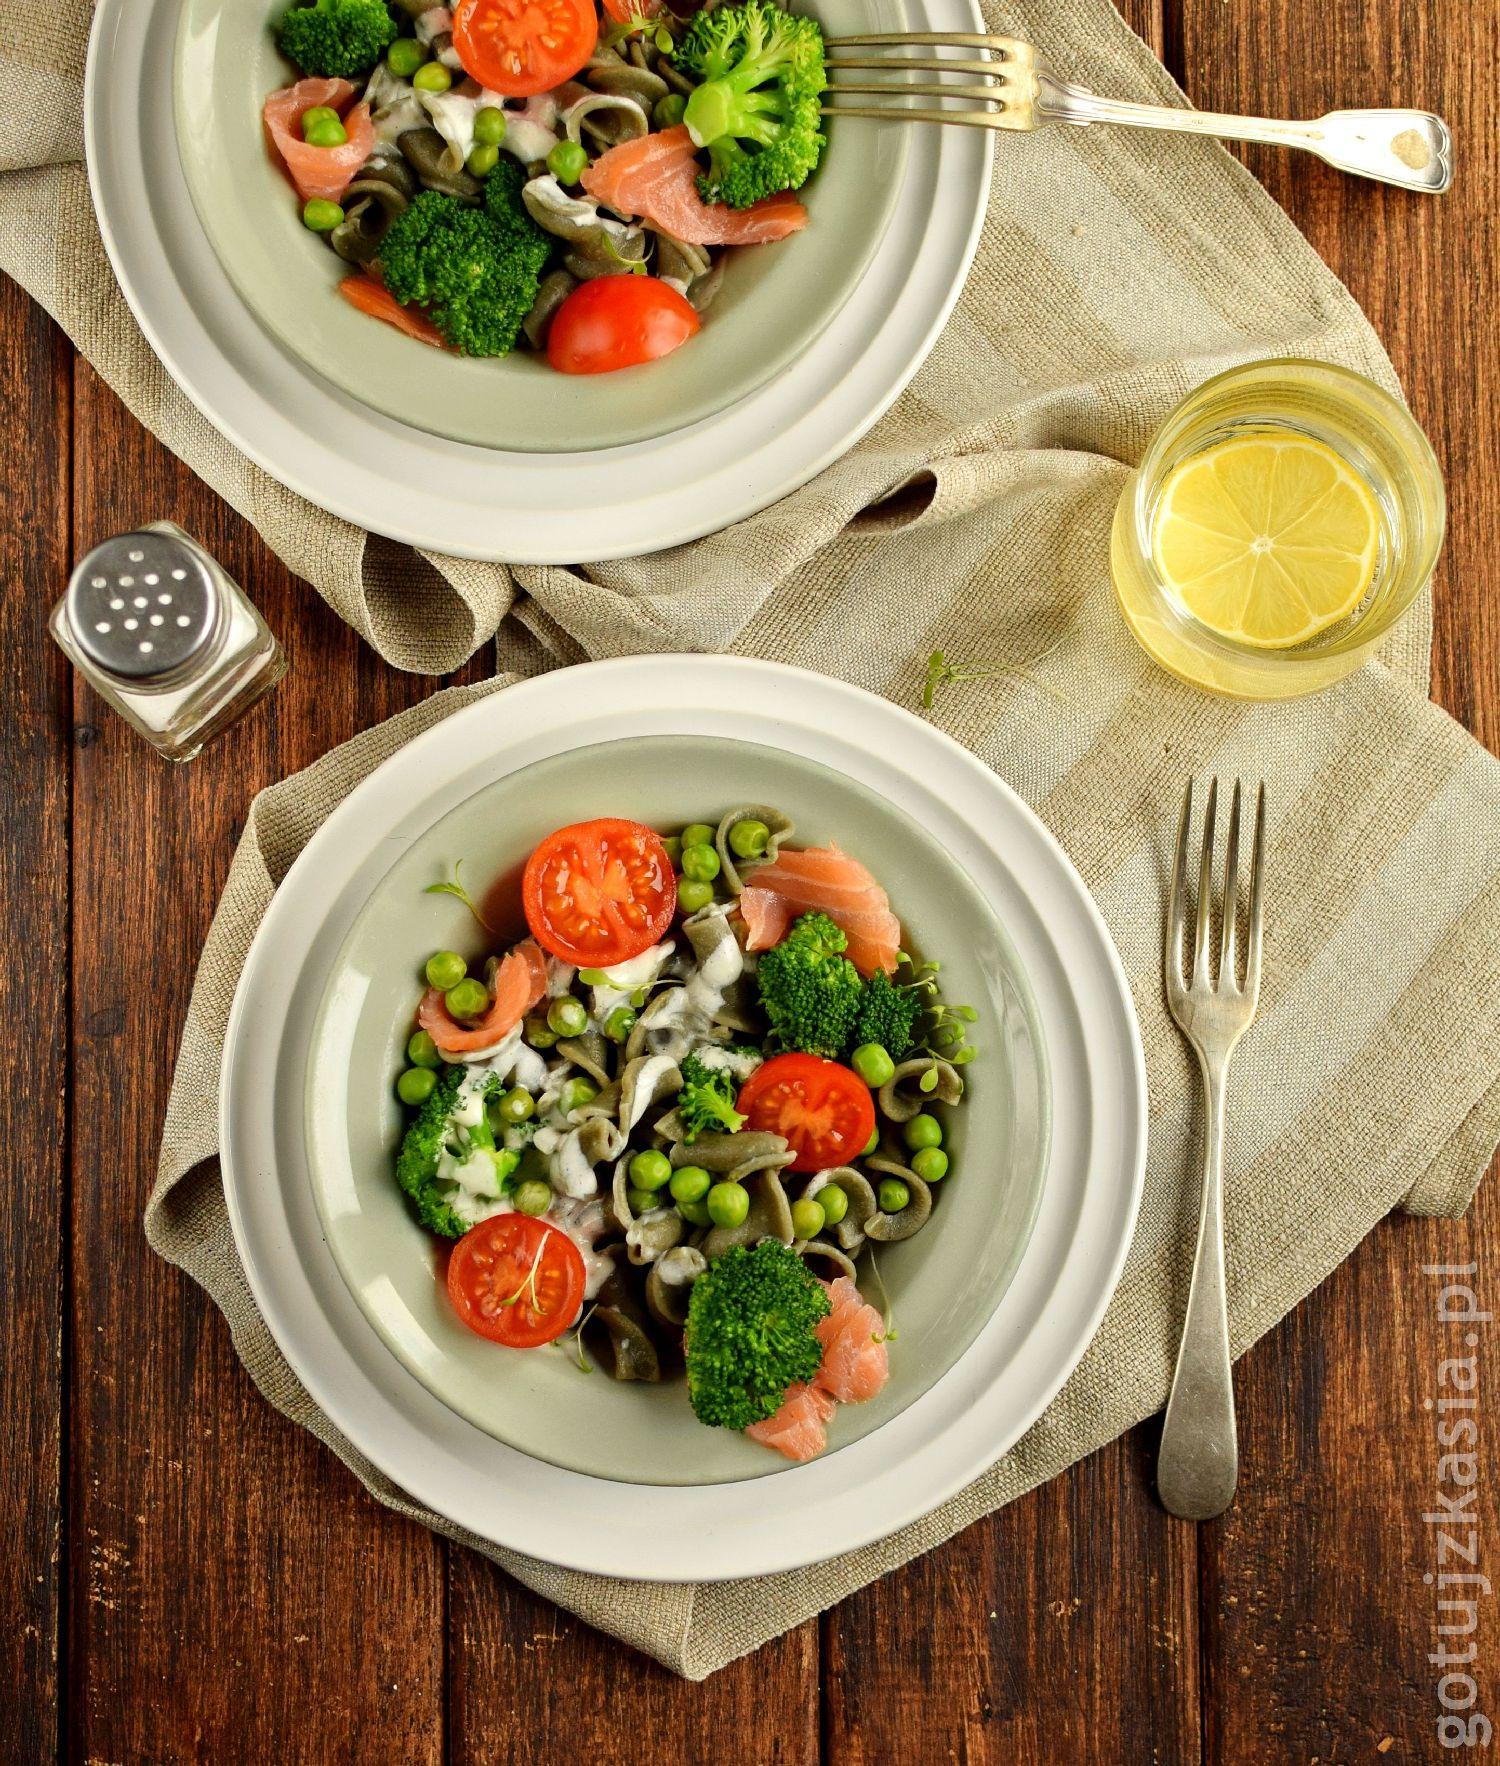 makaron z lososiem i brokulem 1